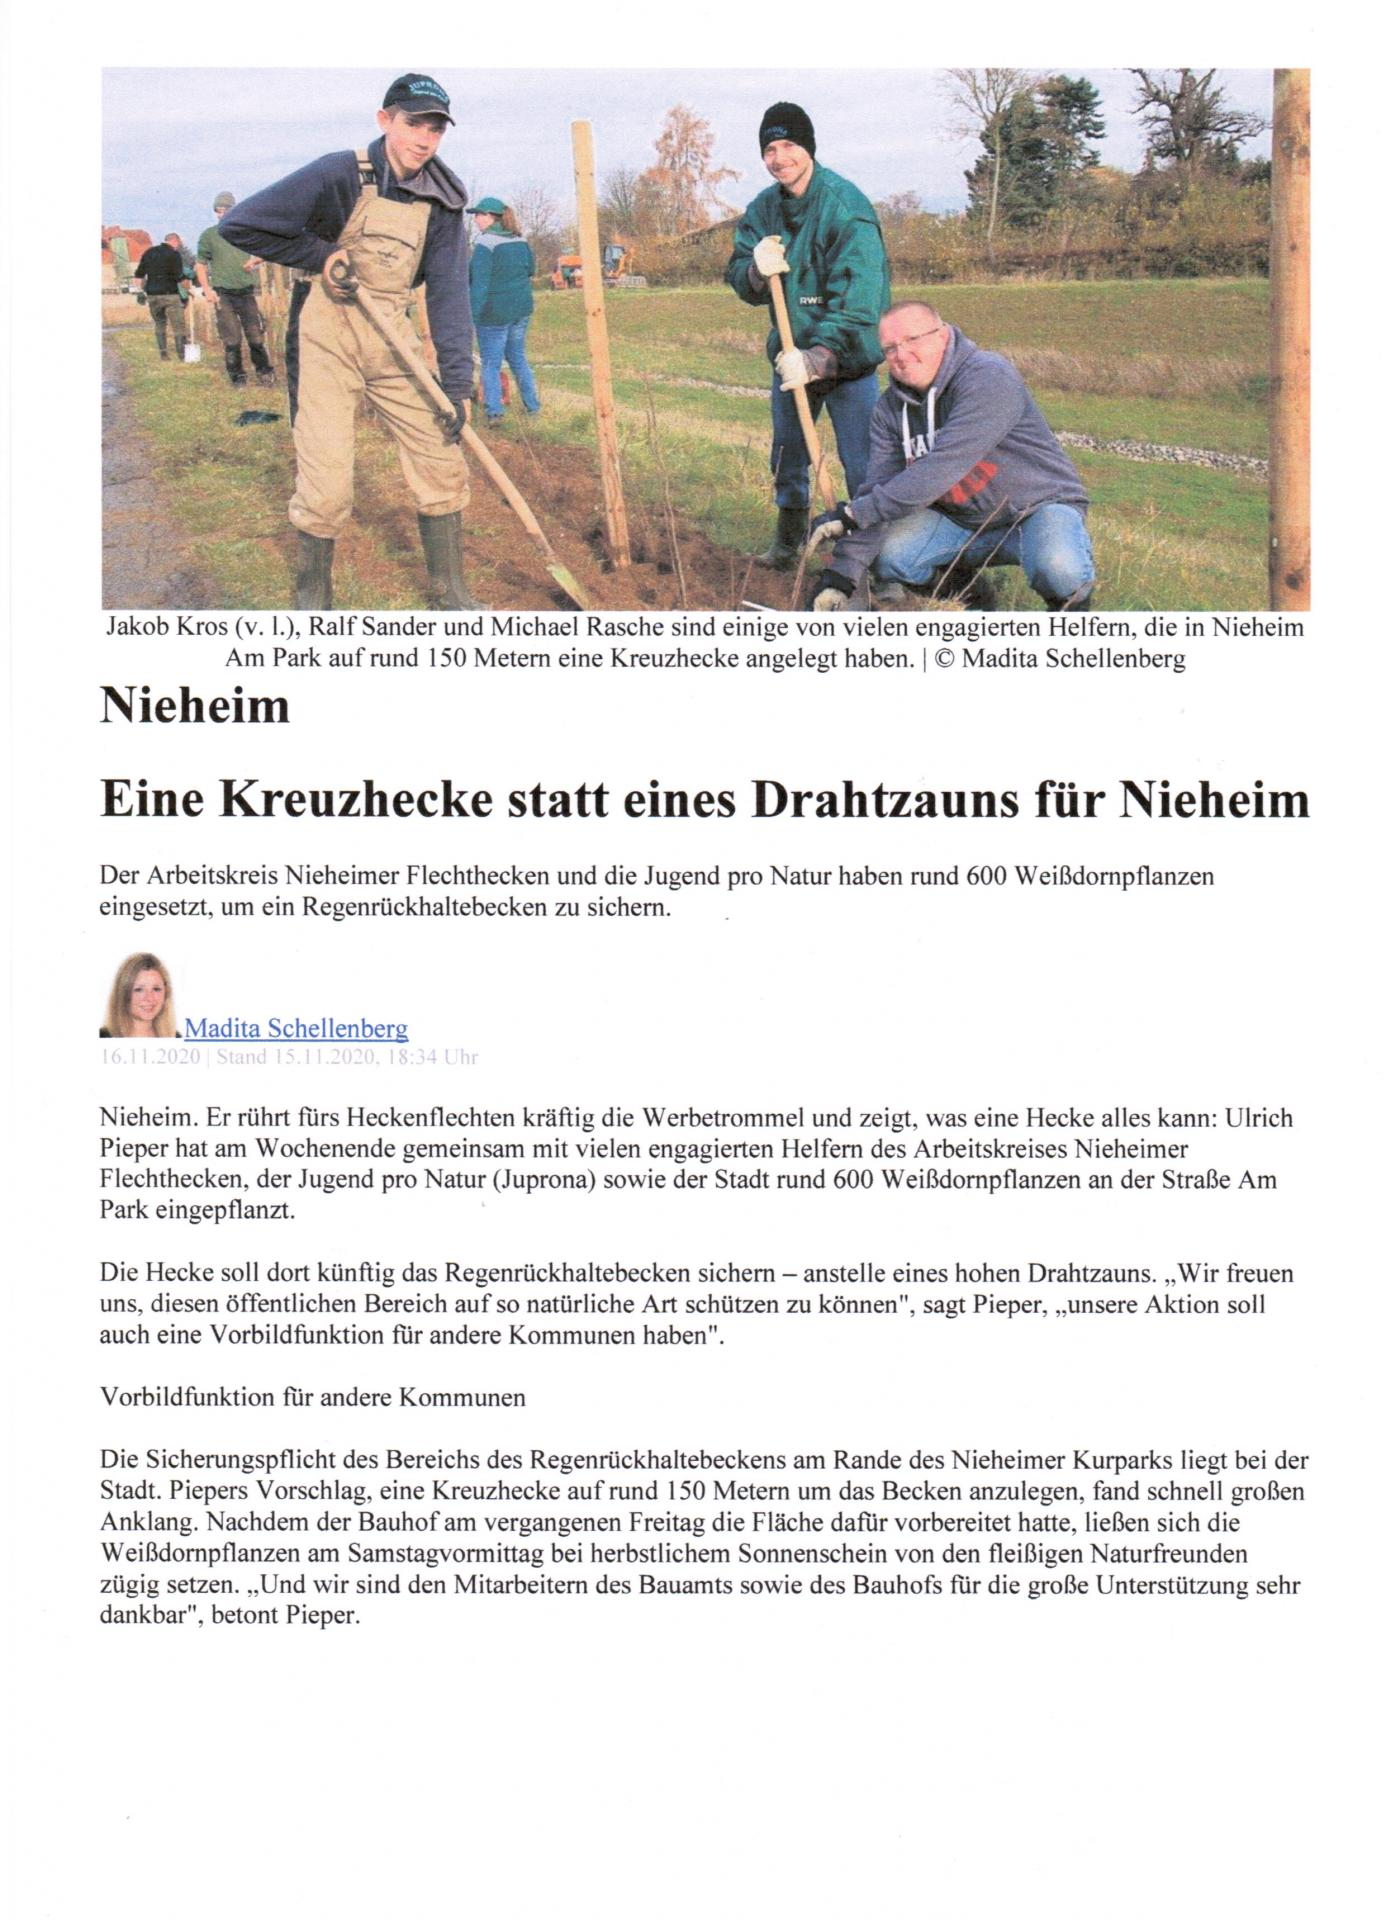 Kreuzhecke 2